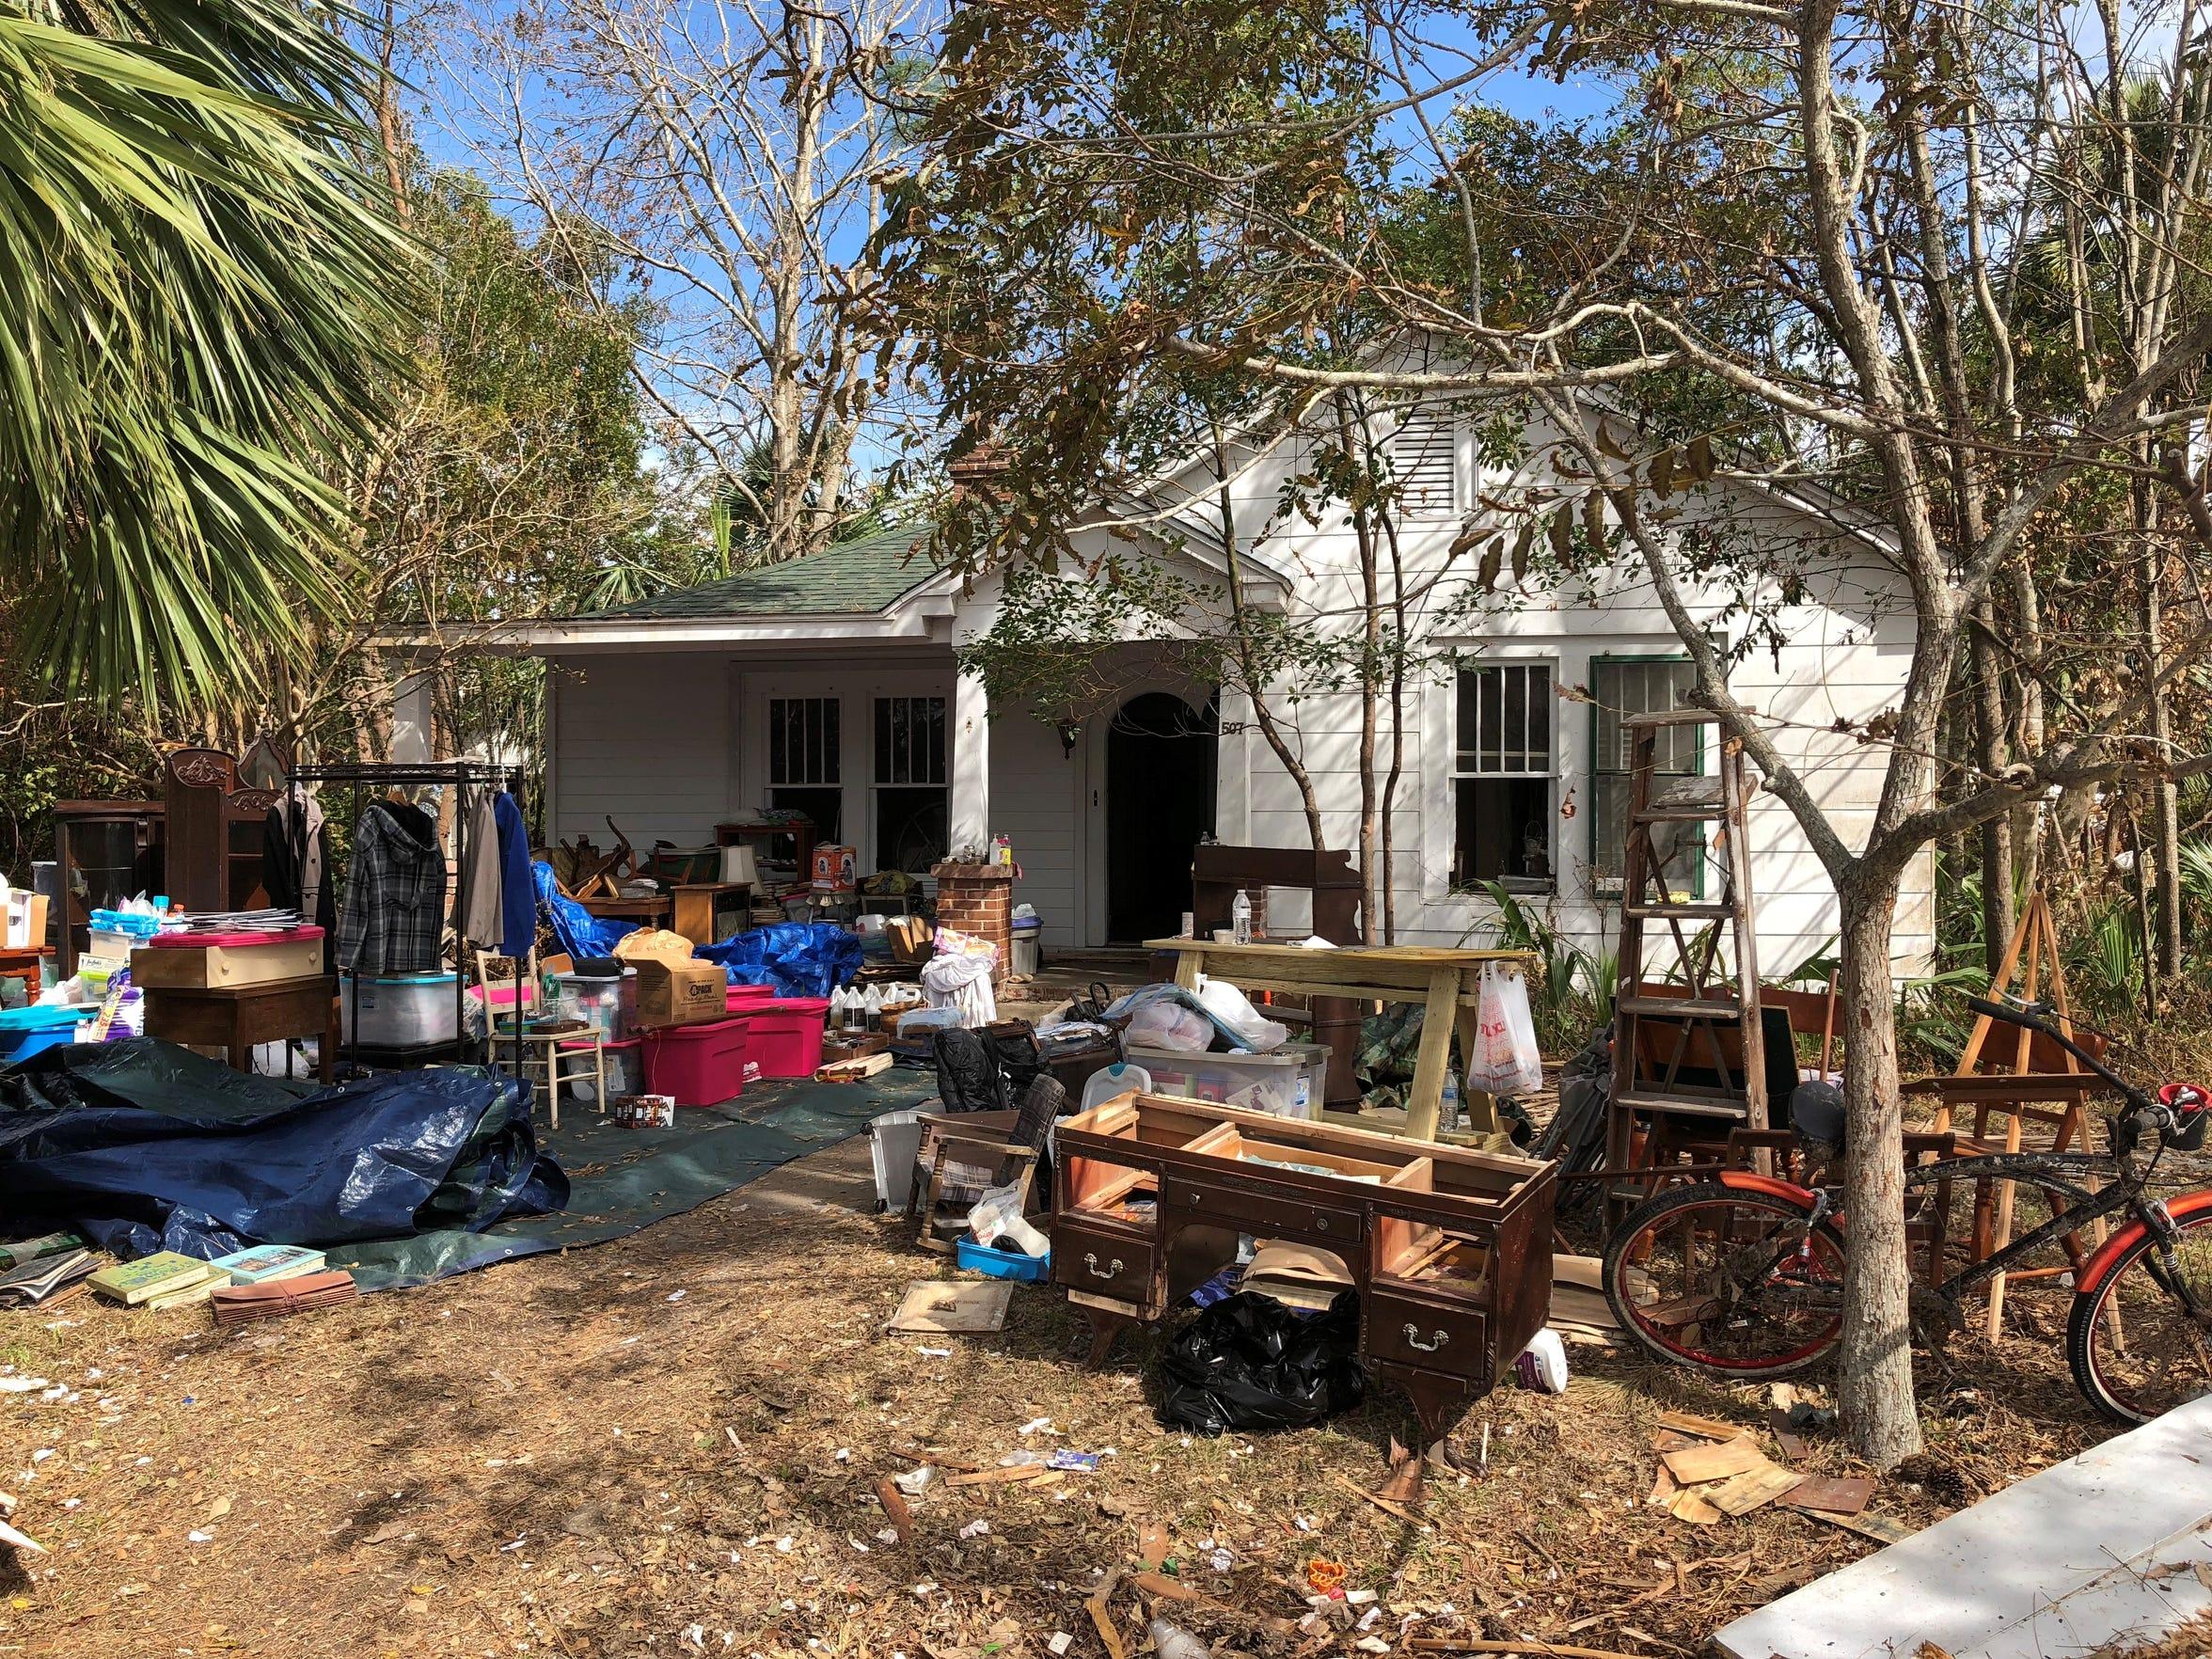 The Port Saint Joe home that Jamie Betz helped clean after Hurricane Michael.